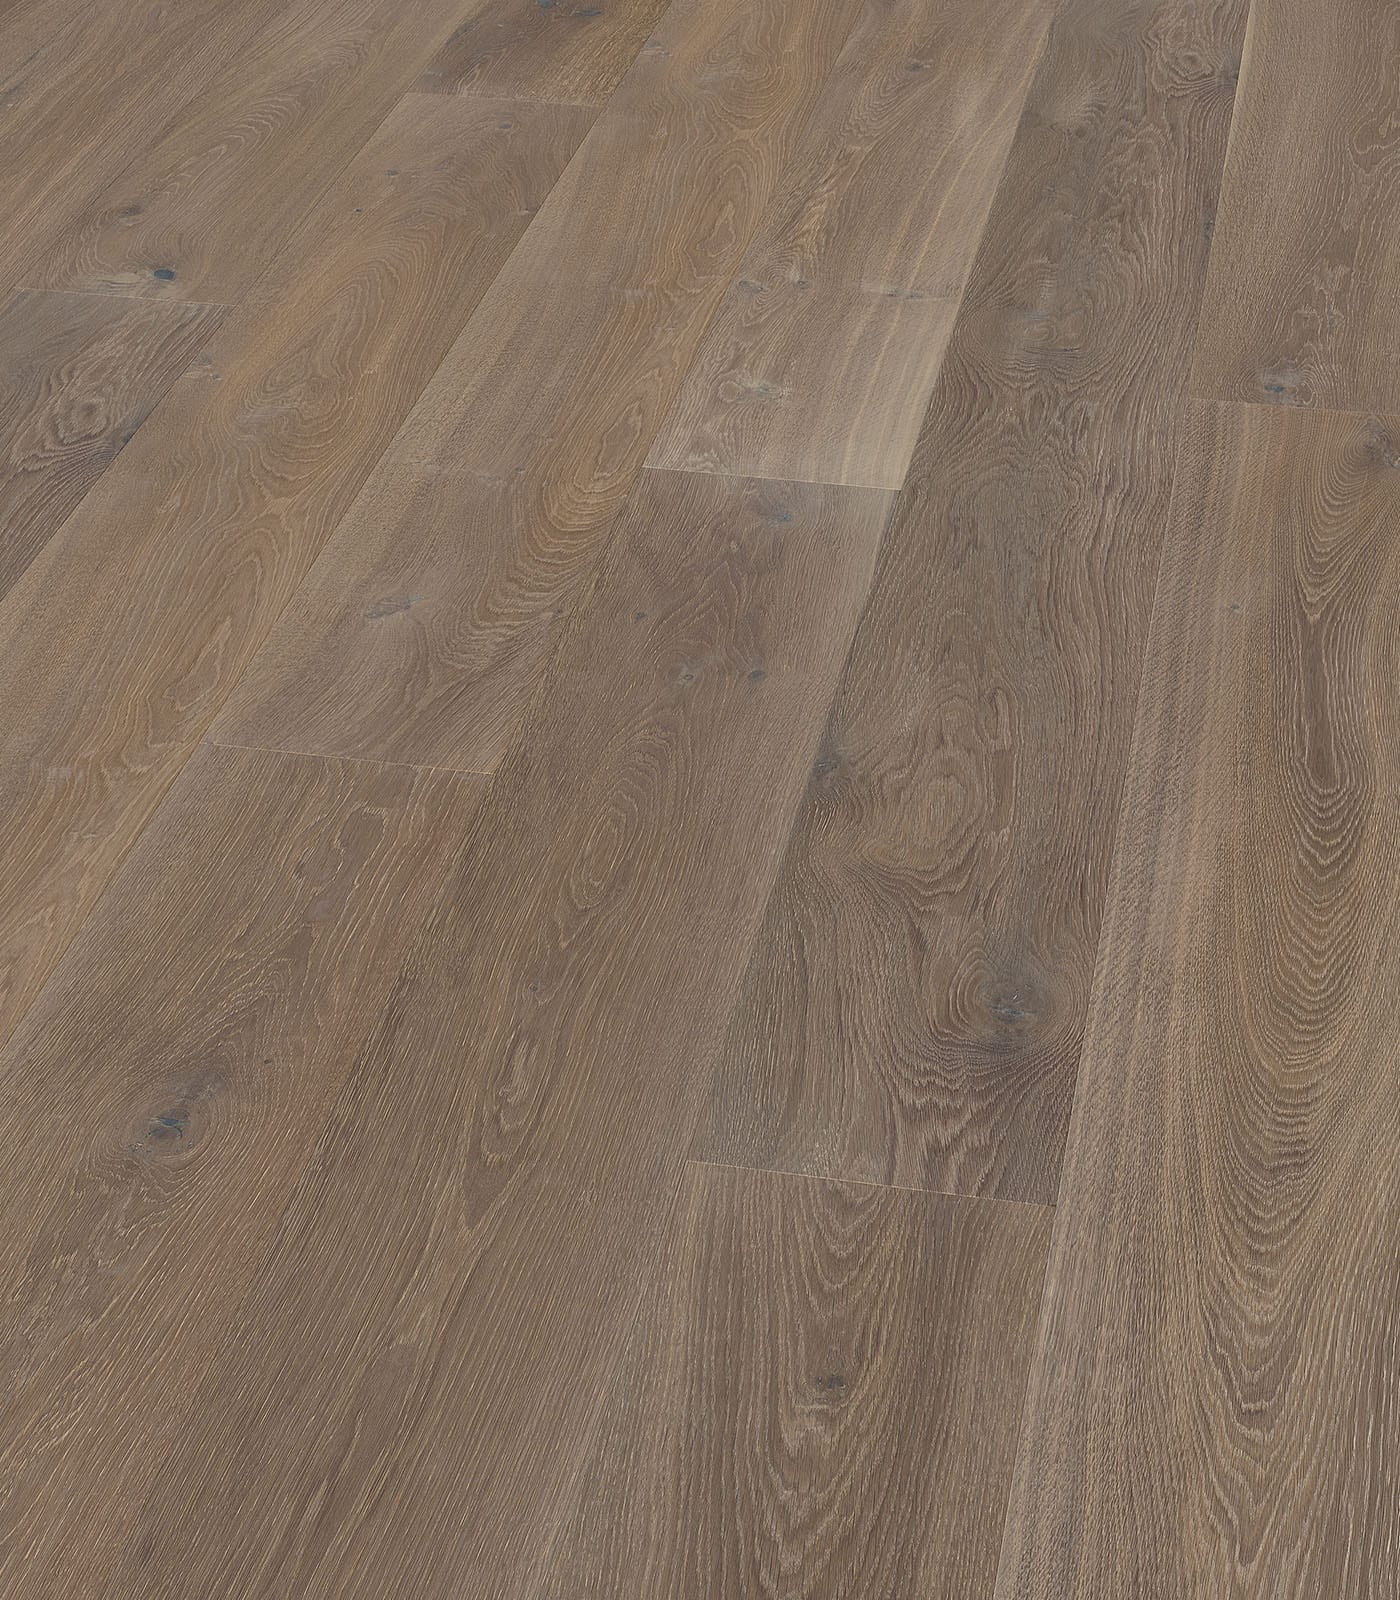 Formentera-European Oak Floors-Lifestyle Collection-angle